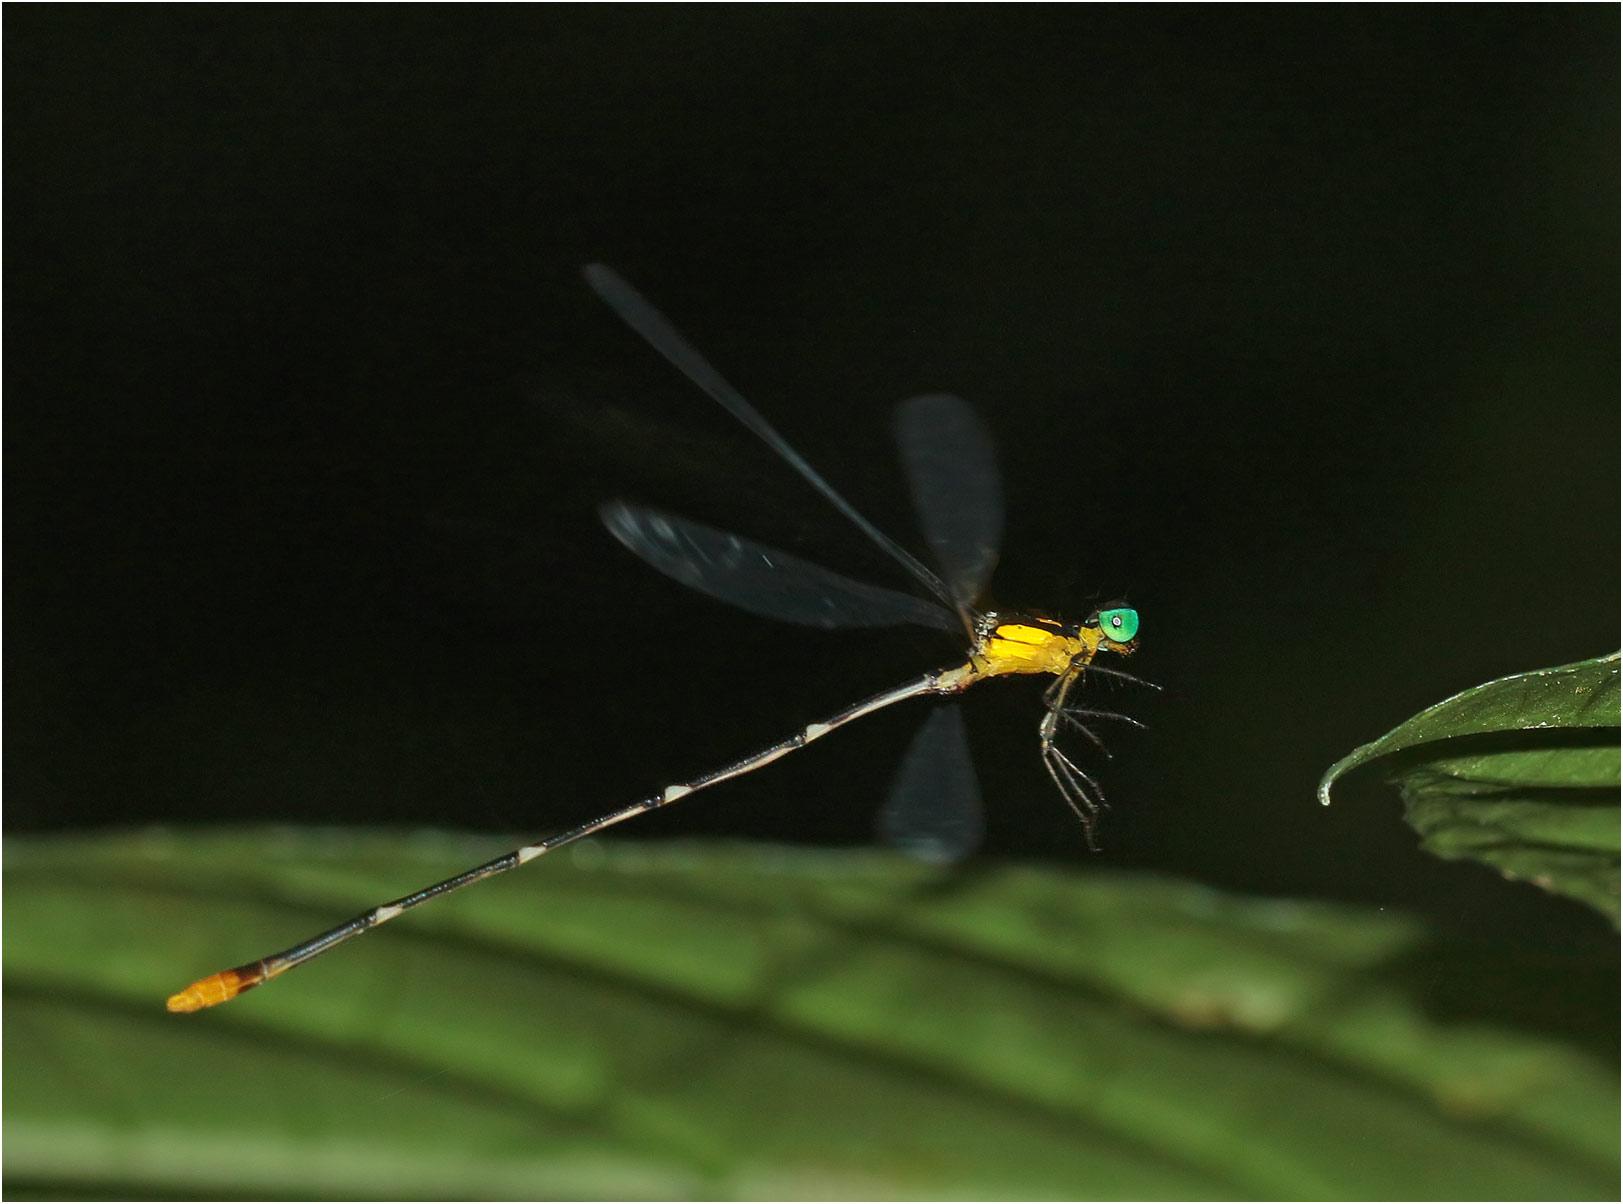 Coeliccia sp. nov. 'p' mâle, Vietnam, Cuc Phuong, 14/06/2018